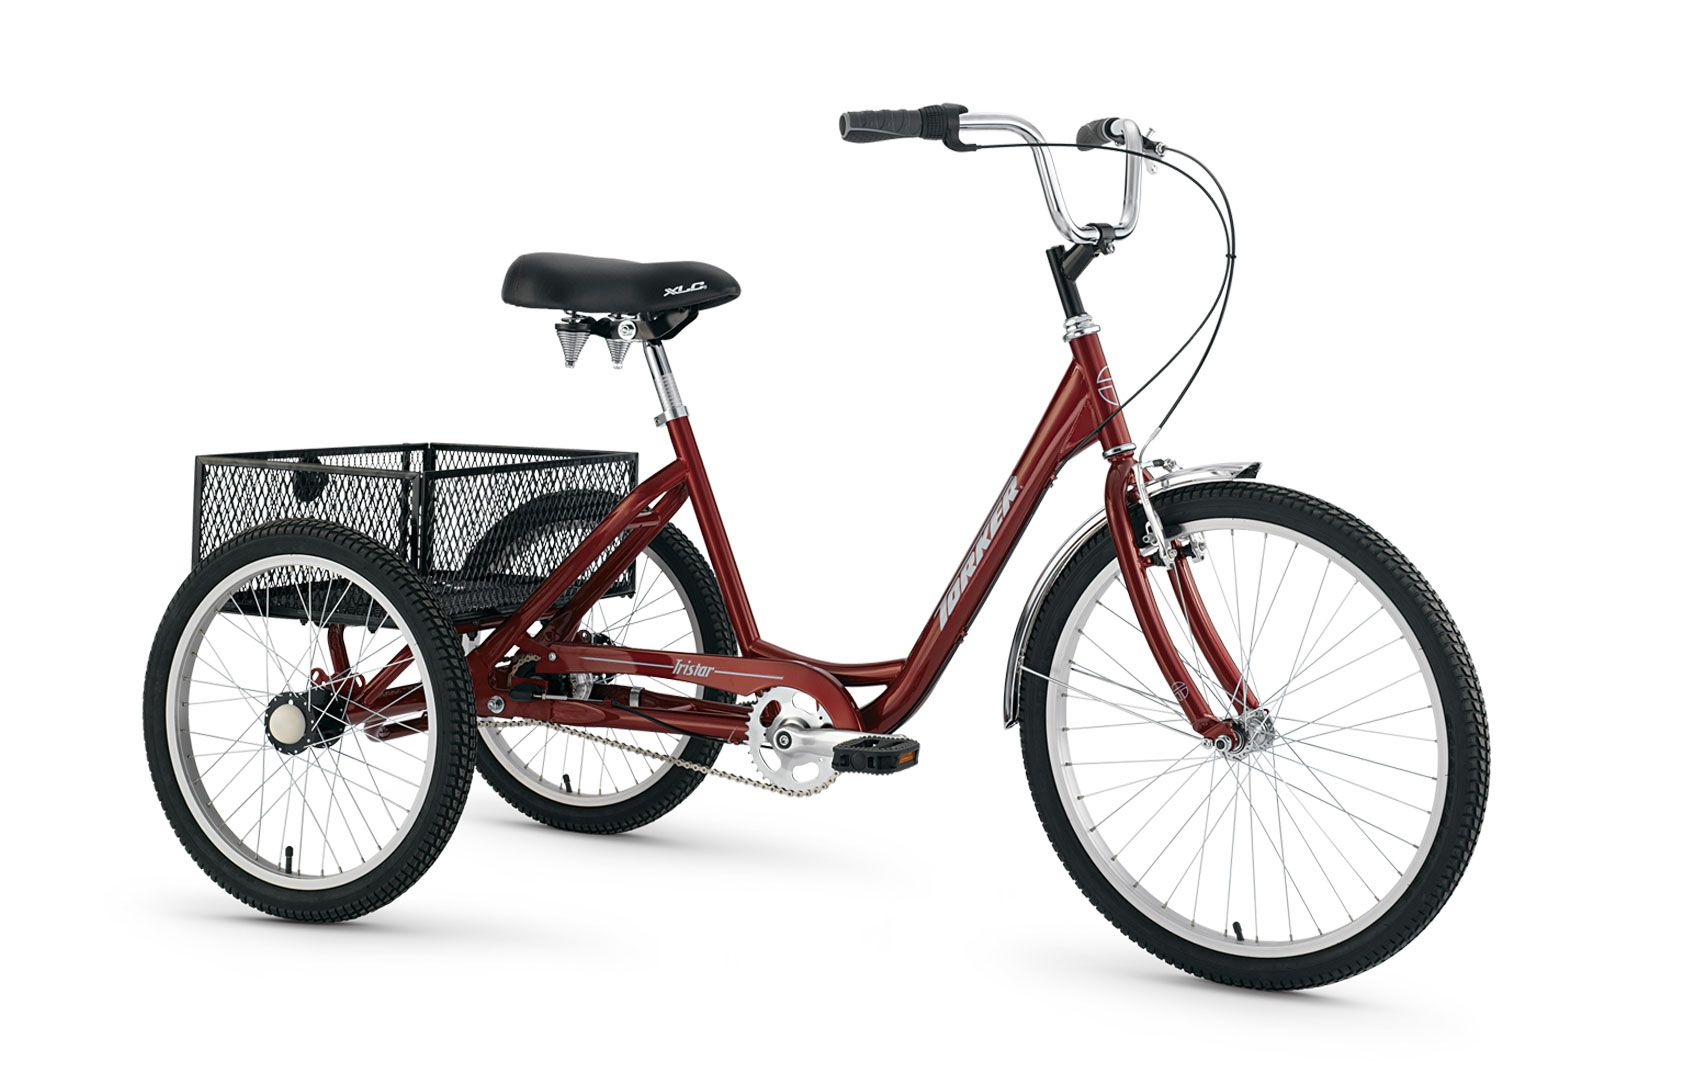 Pin on new bike